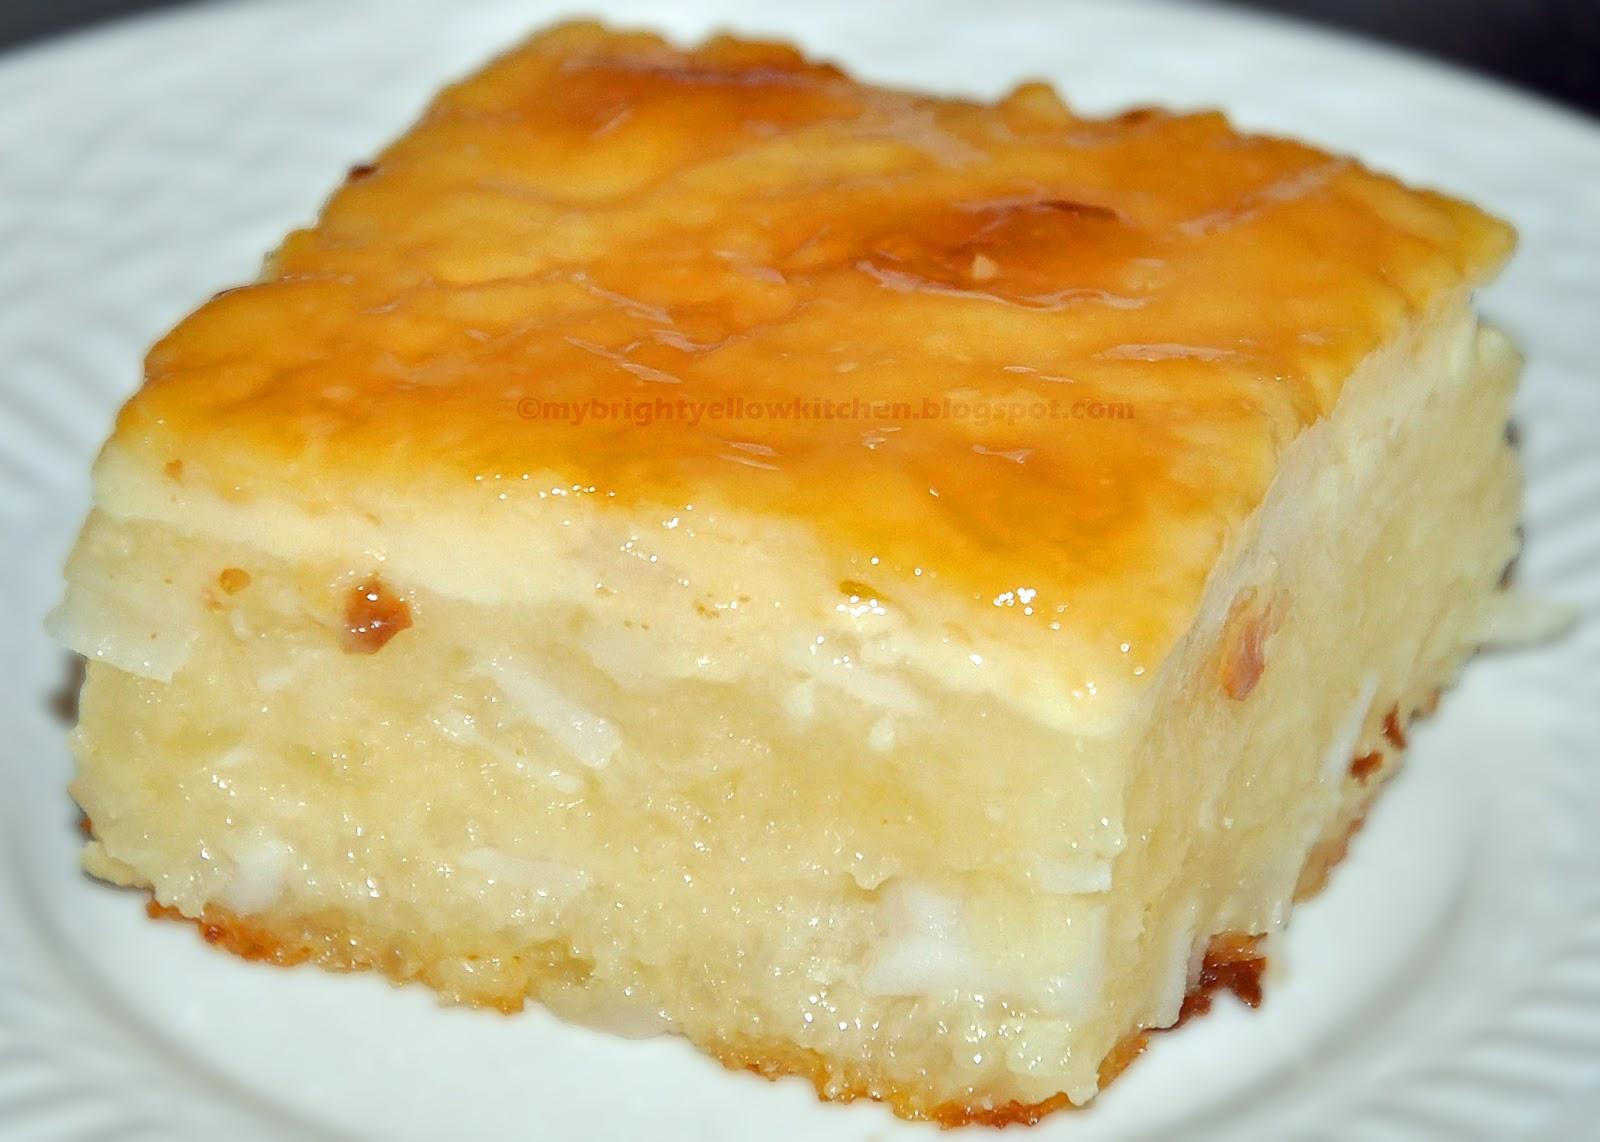 Filipino Style Cassava Cake Recipe